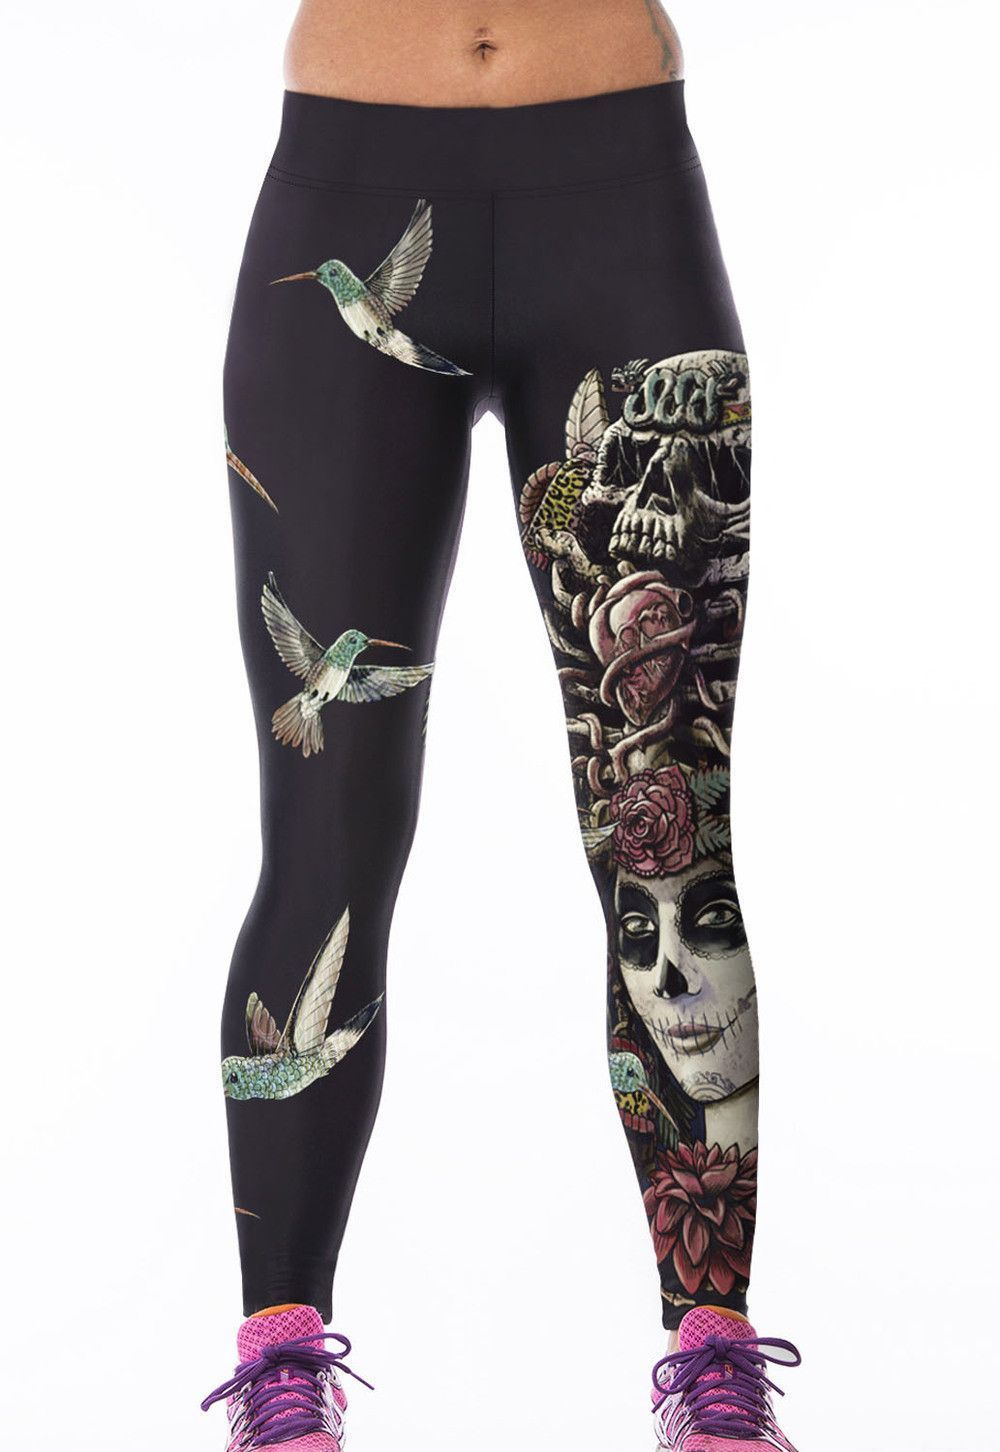 fea54da975 Fuchsia Night Owl/Game Time/Skull Queen Punk High Stretch Leggings LC79746  Running Fitness Tight Pants Printed Stretch Slim Pant